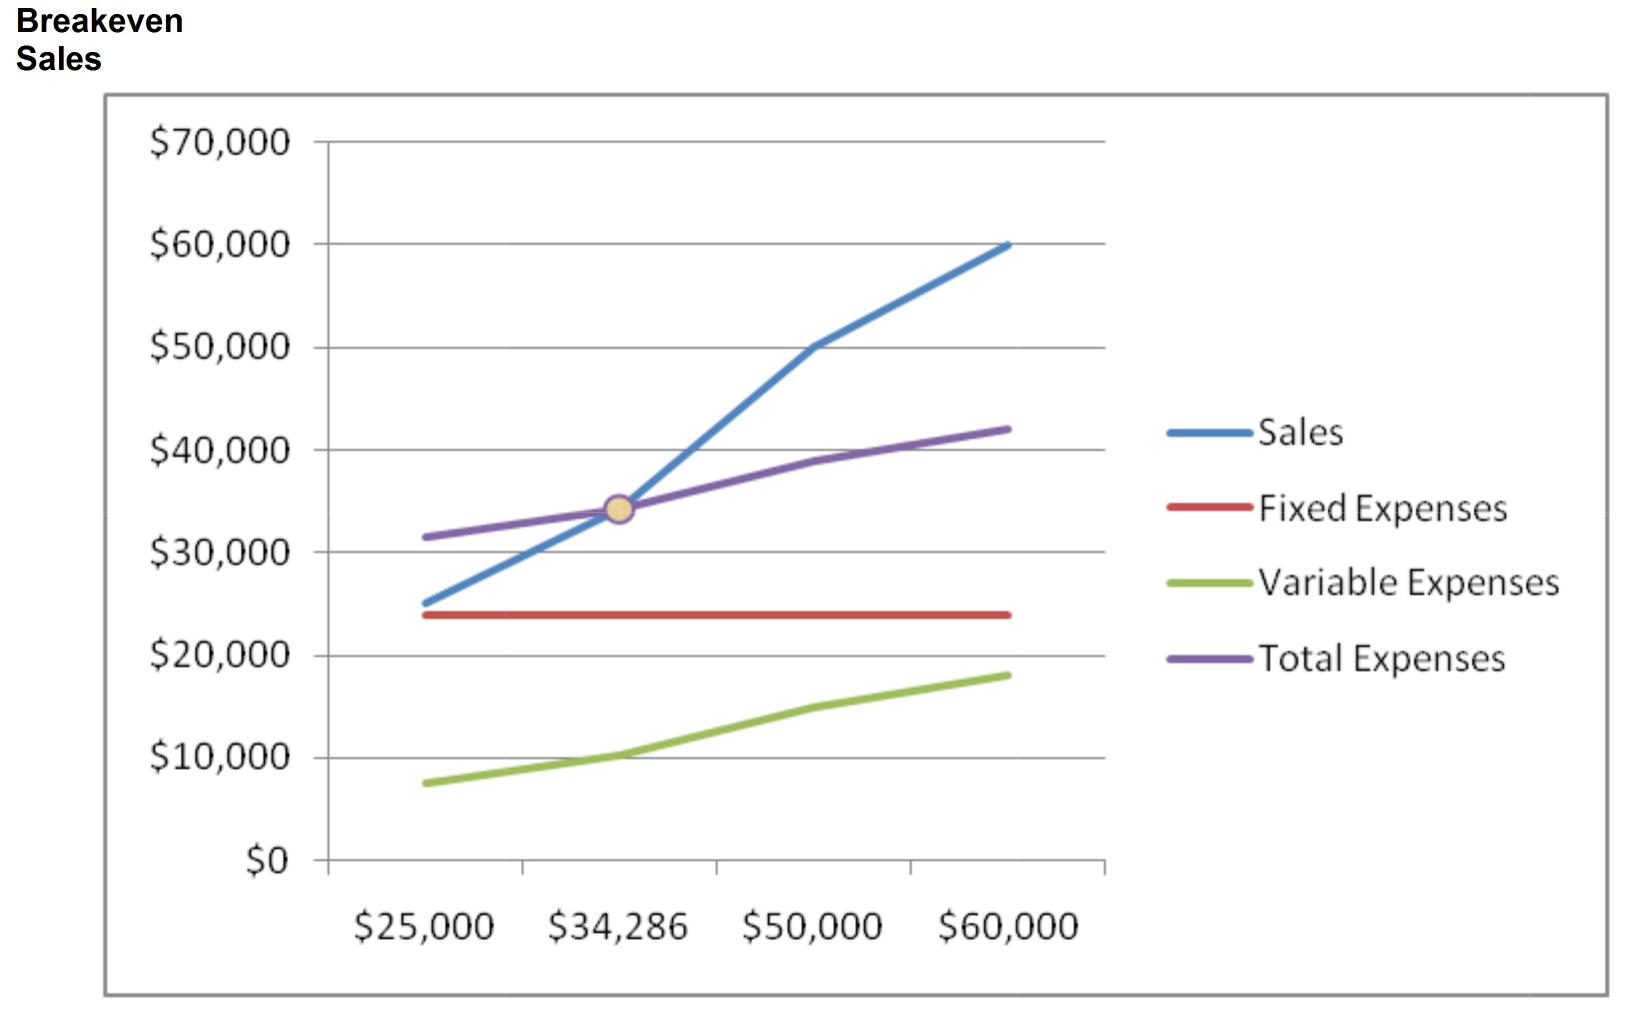 Breakeven Sales Graph